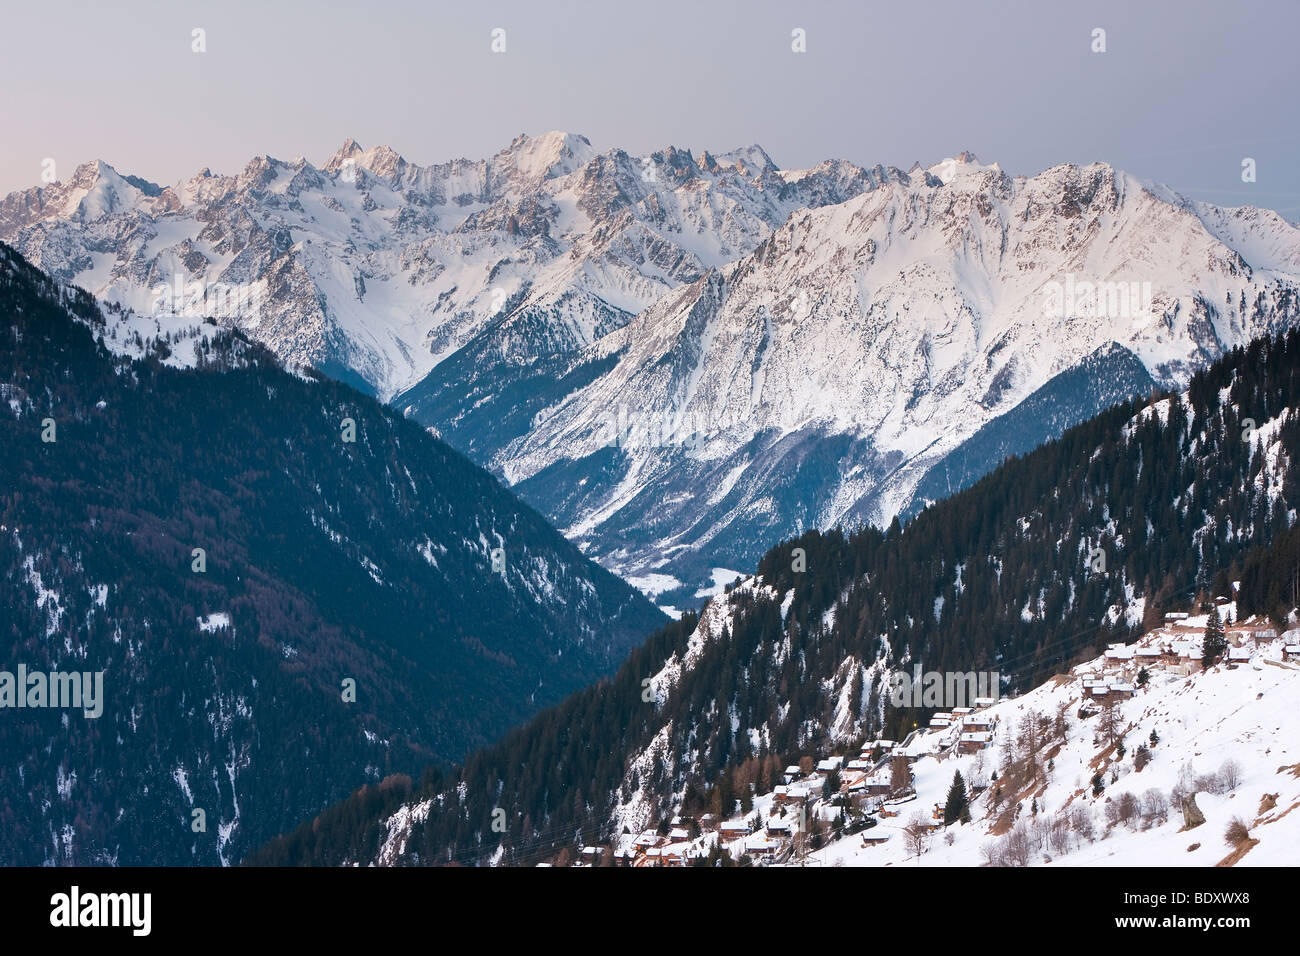 Verbier, Valais, Four Valleys region, Bernese Alps, Switzerland - Stock Image